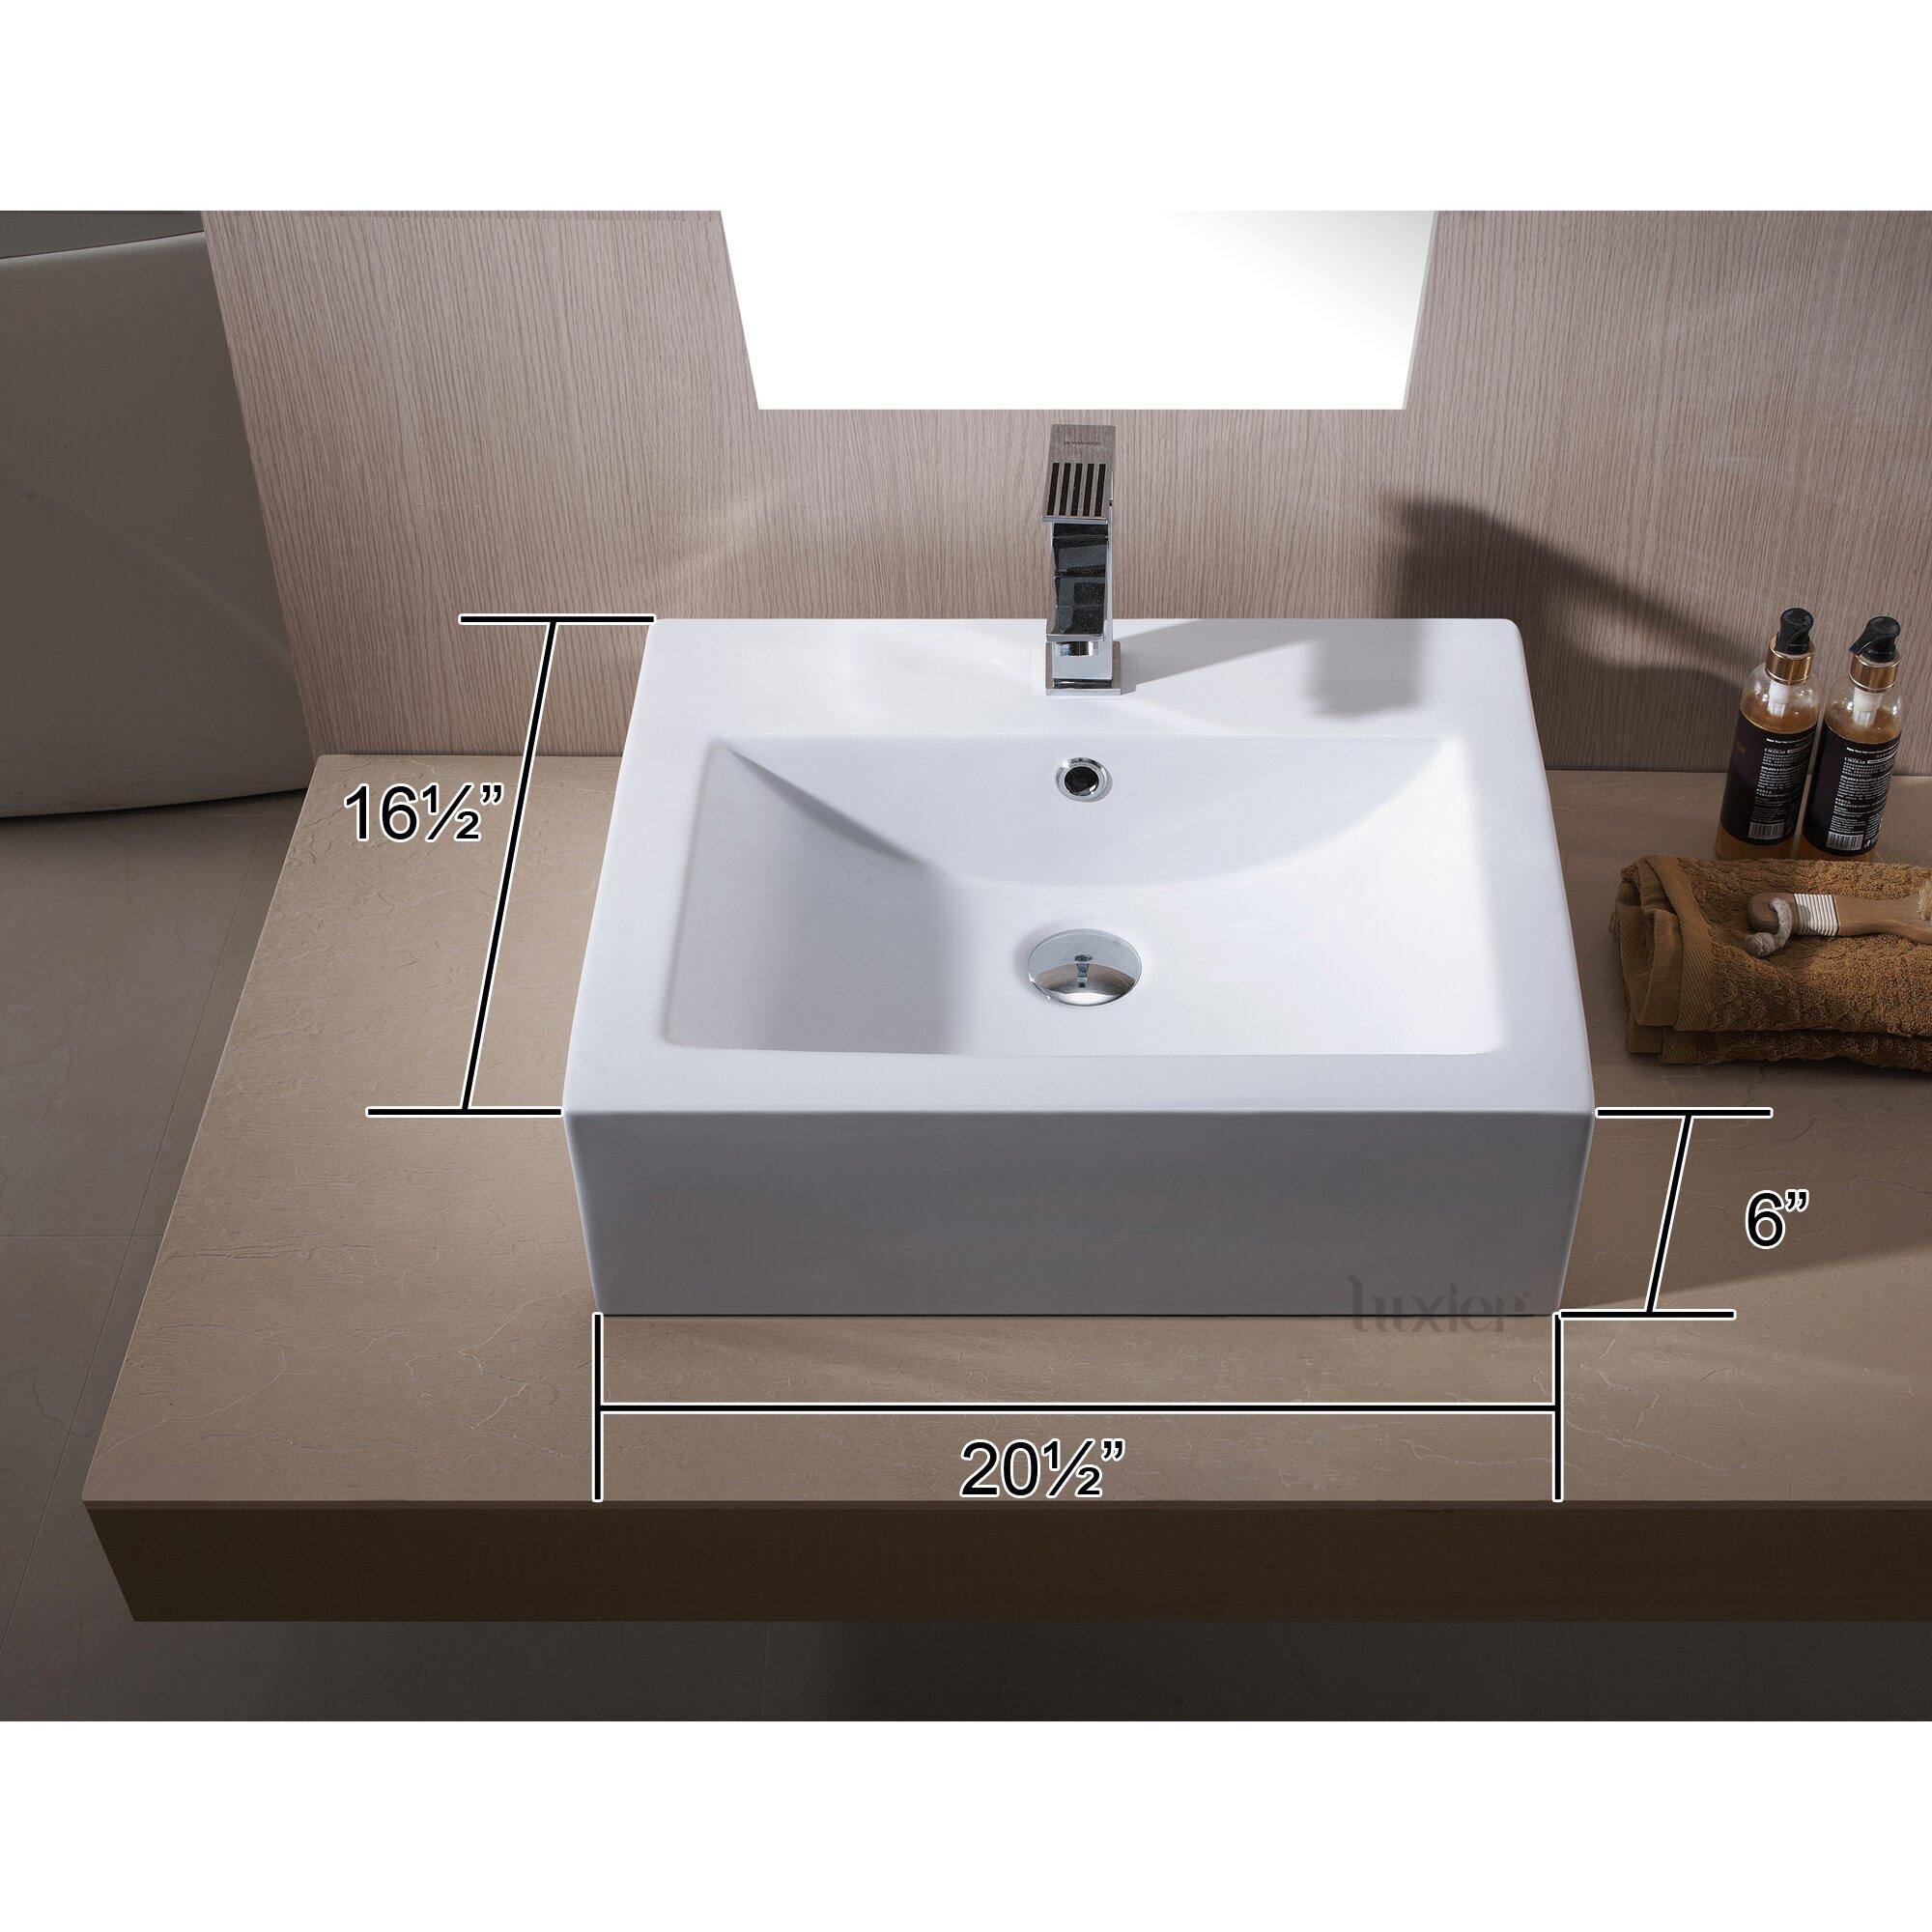 Porcelain Sinks Bathroom Vanities : Luxier L-003 Bathroom Porcelain Ceramic Vessel Vanity Sink Art Basin ...